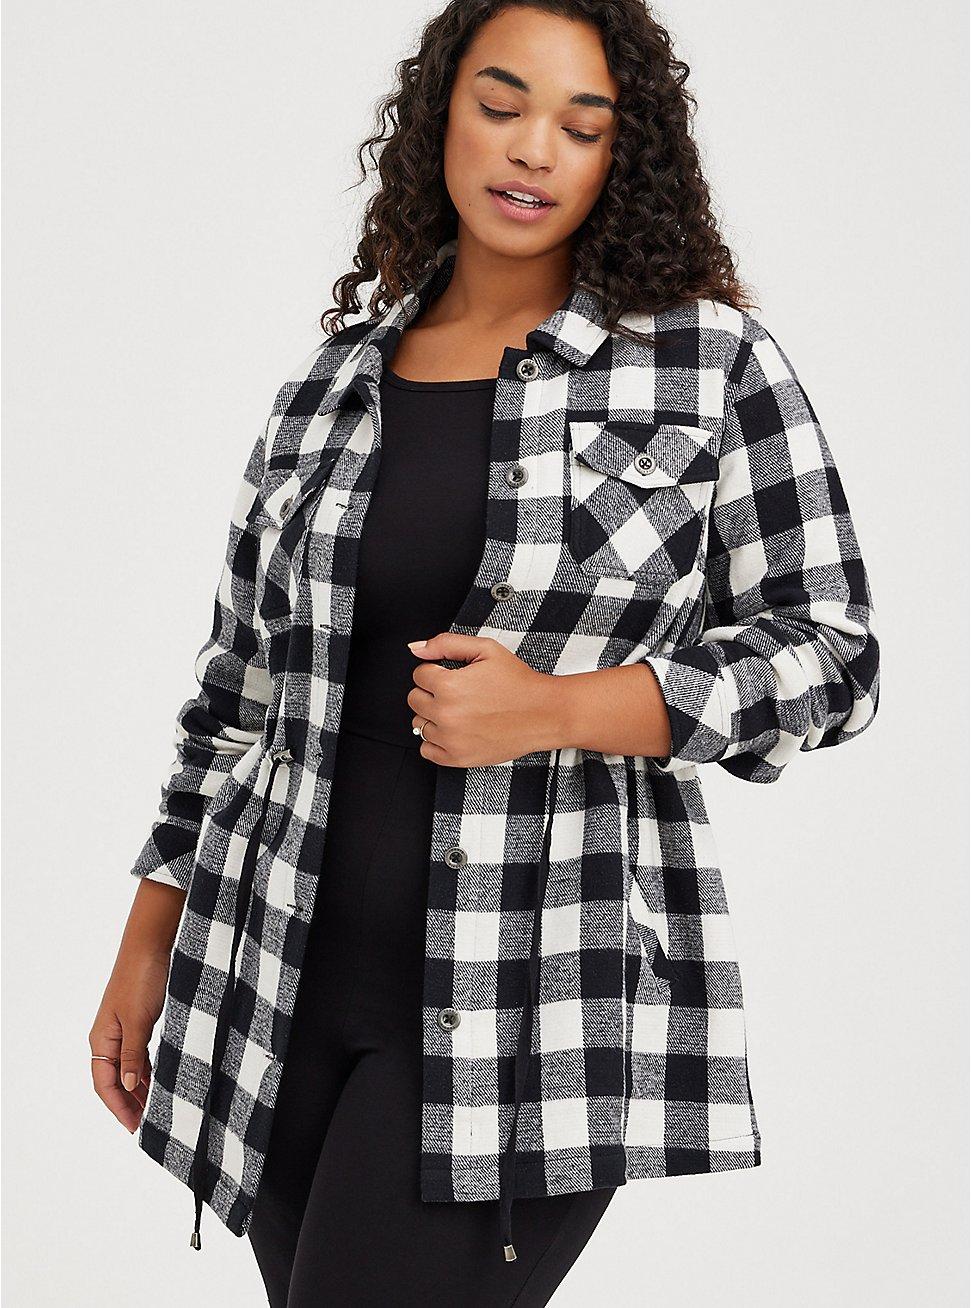 Shacket - Brushed Cotton Plaid Black & White, PLAID - BLACK, hi-res